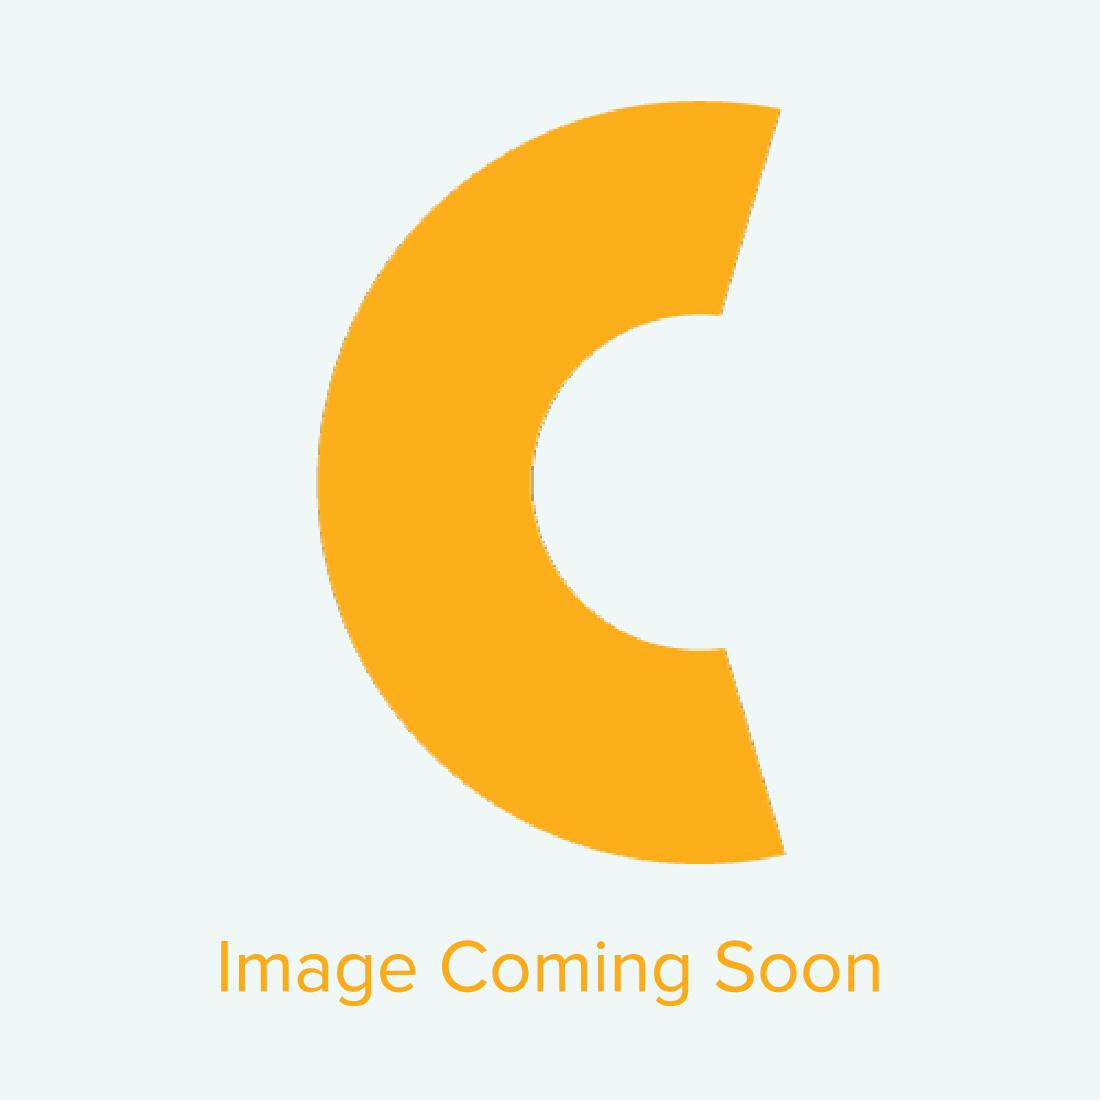 Basketball Crest, Sports, Team Spirit, SVG Design